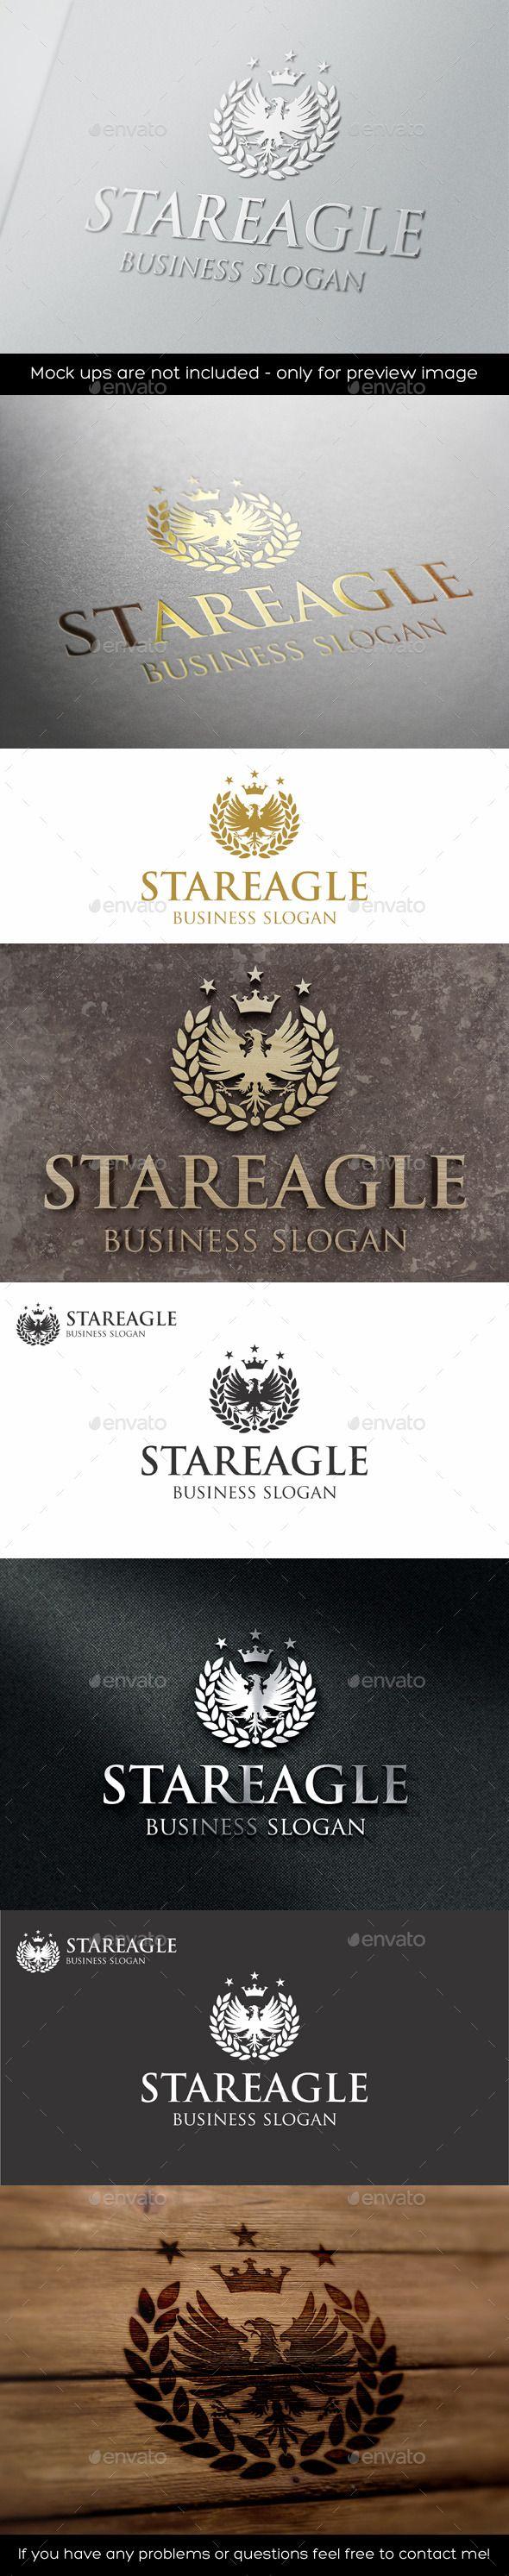 best ideas about star logo logo inspiration royal eagle star logo